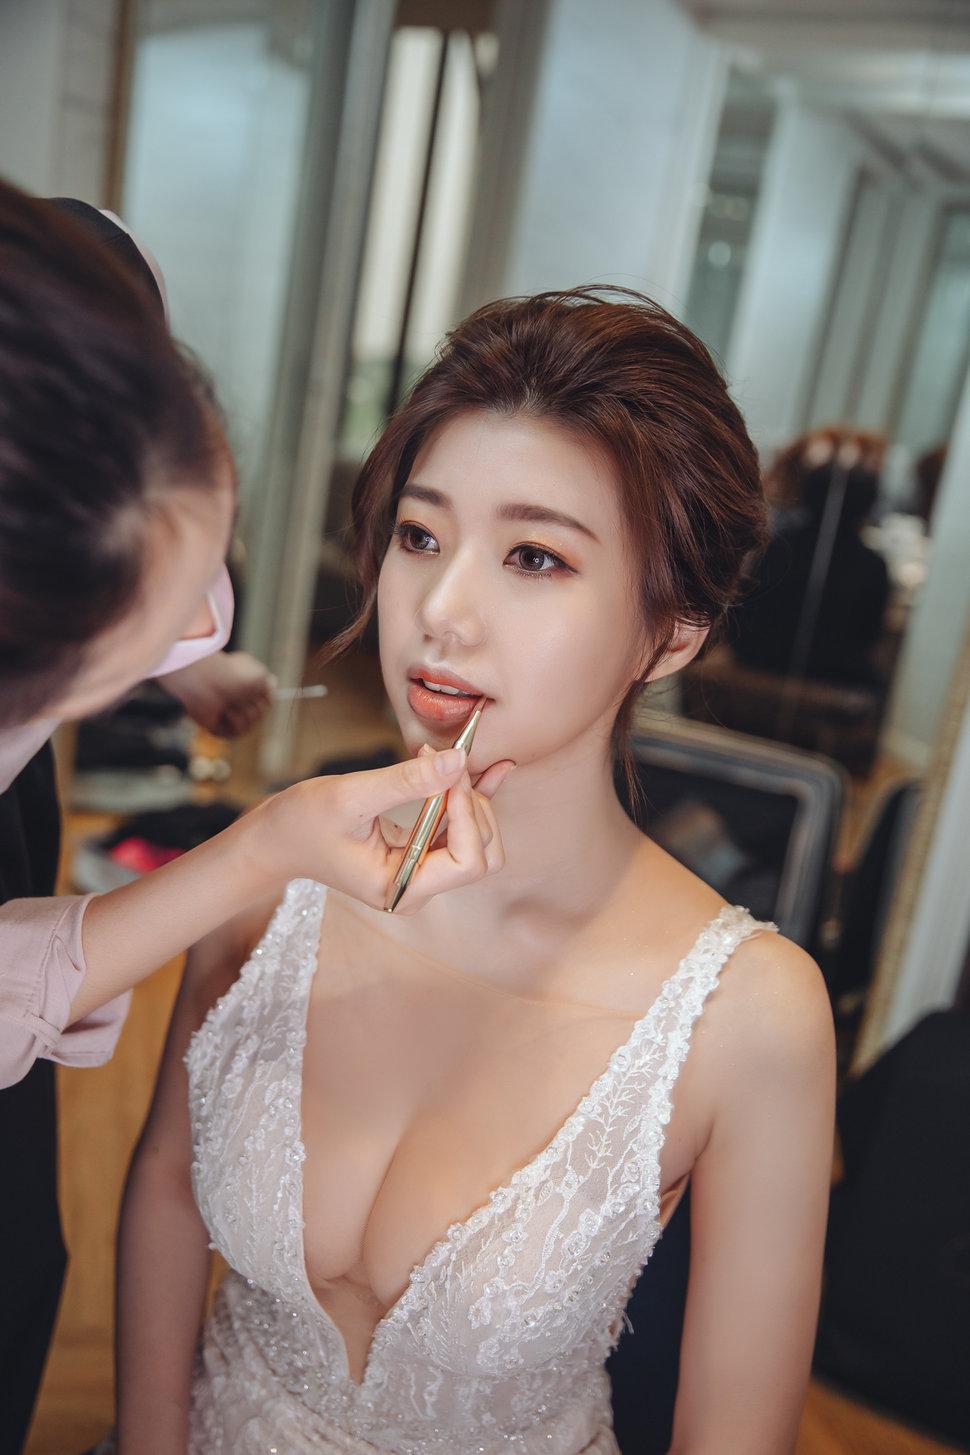 20200411-20200411-QUAN0614-編輯 - QUAN  婚禮紀錄 / 影像工作室《結婚吧》